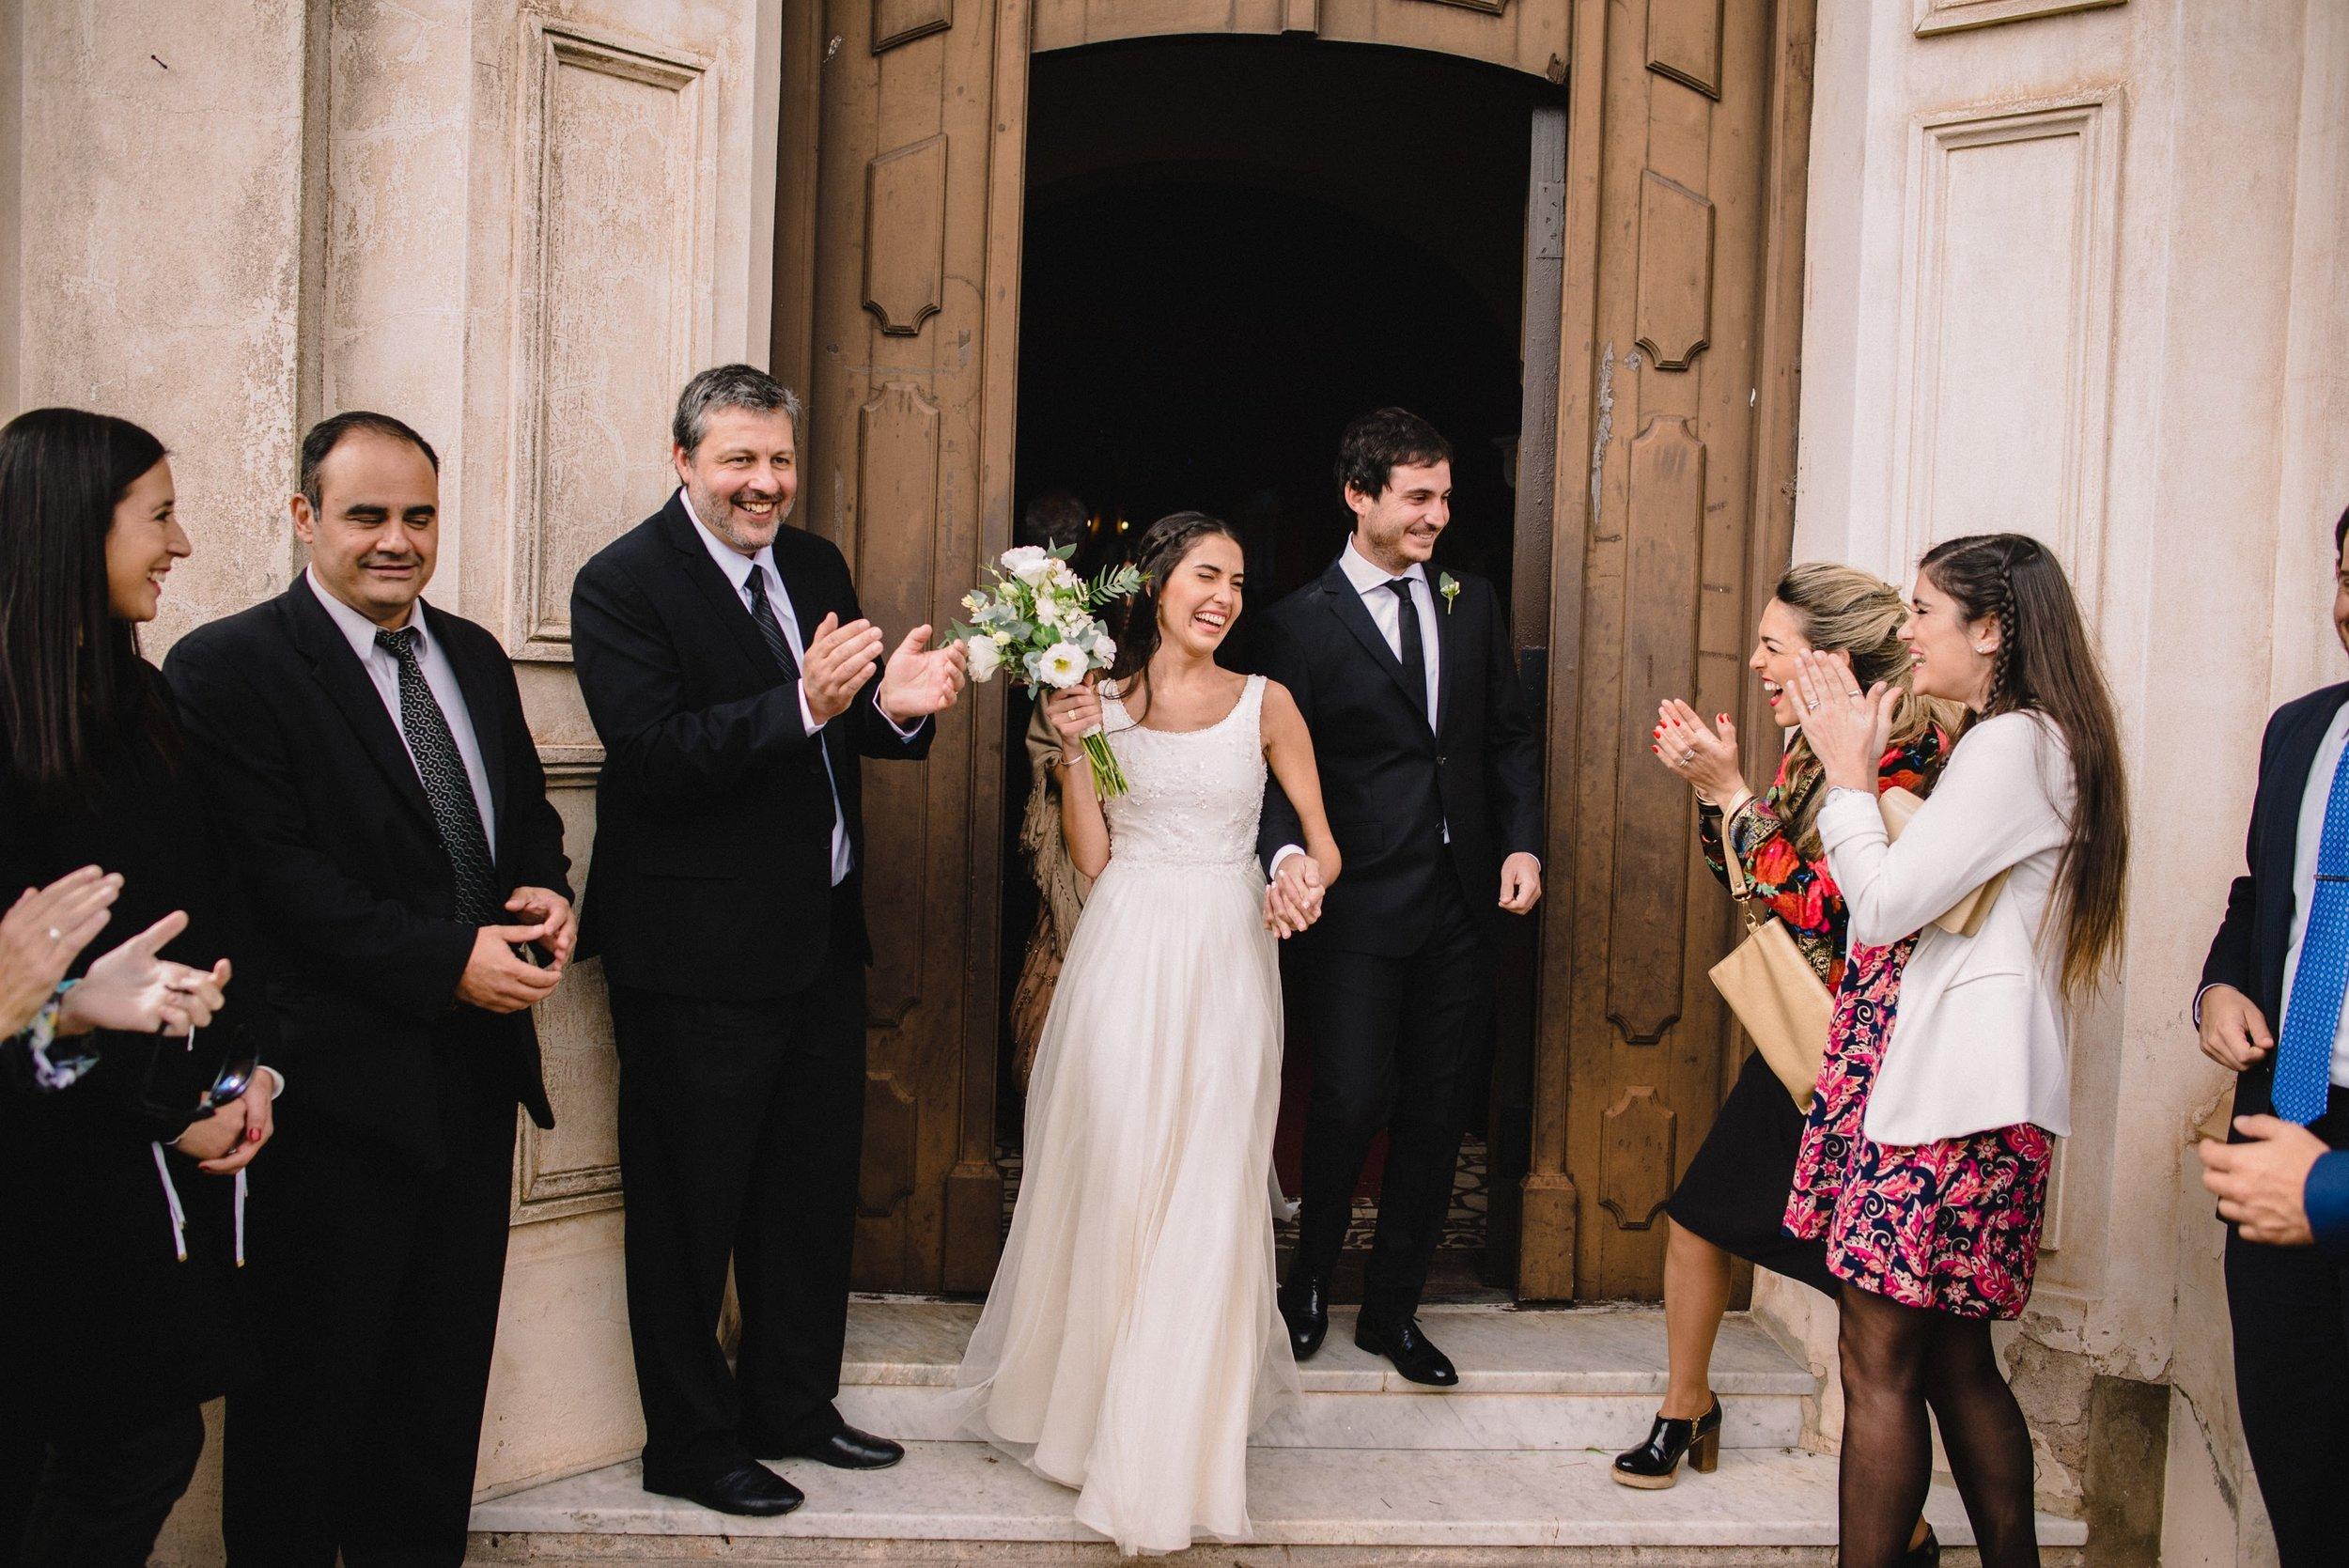 fotografo de bodas en carlos paz cordoba 036.JPG